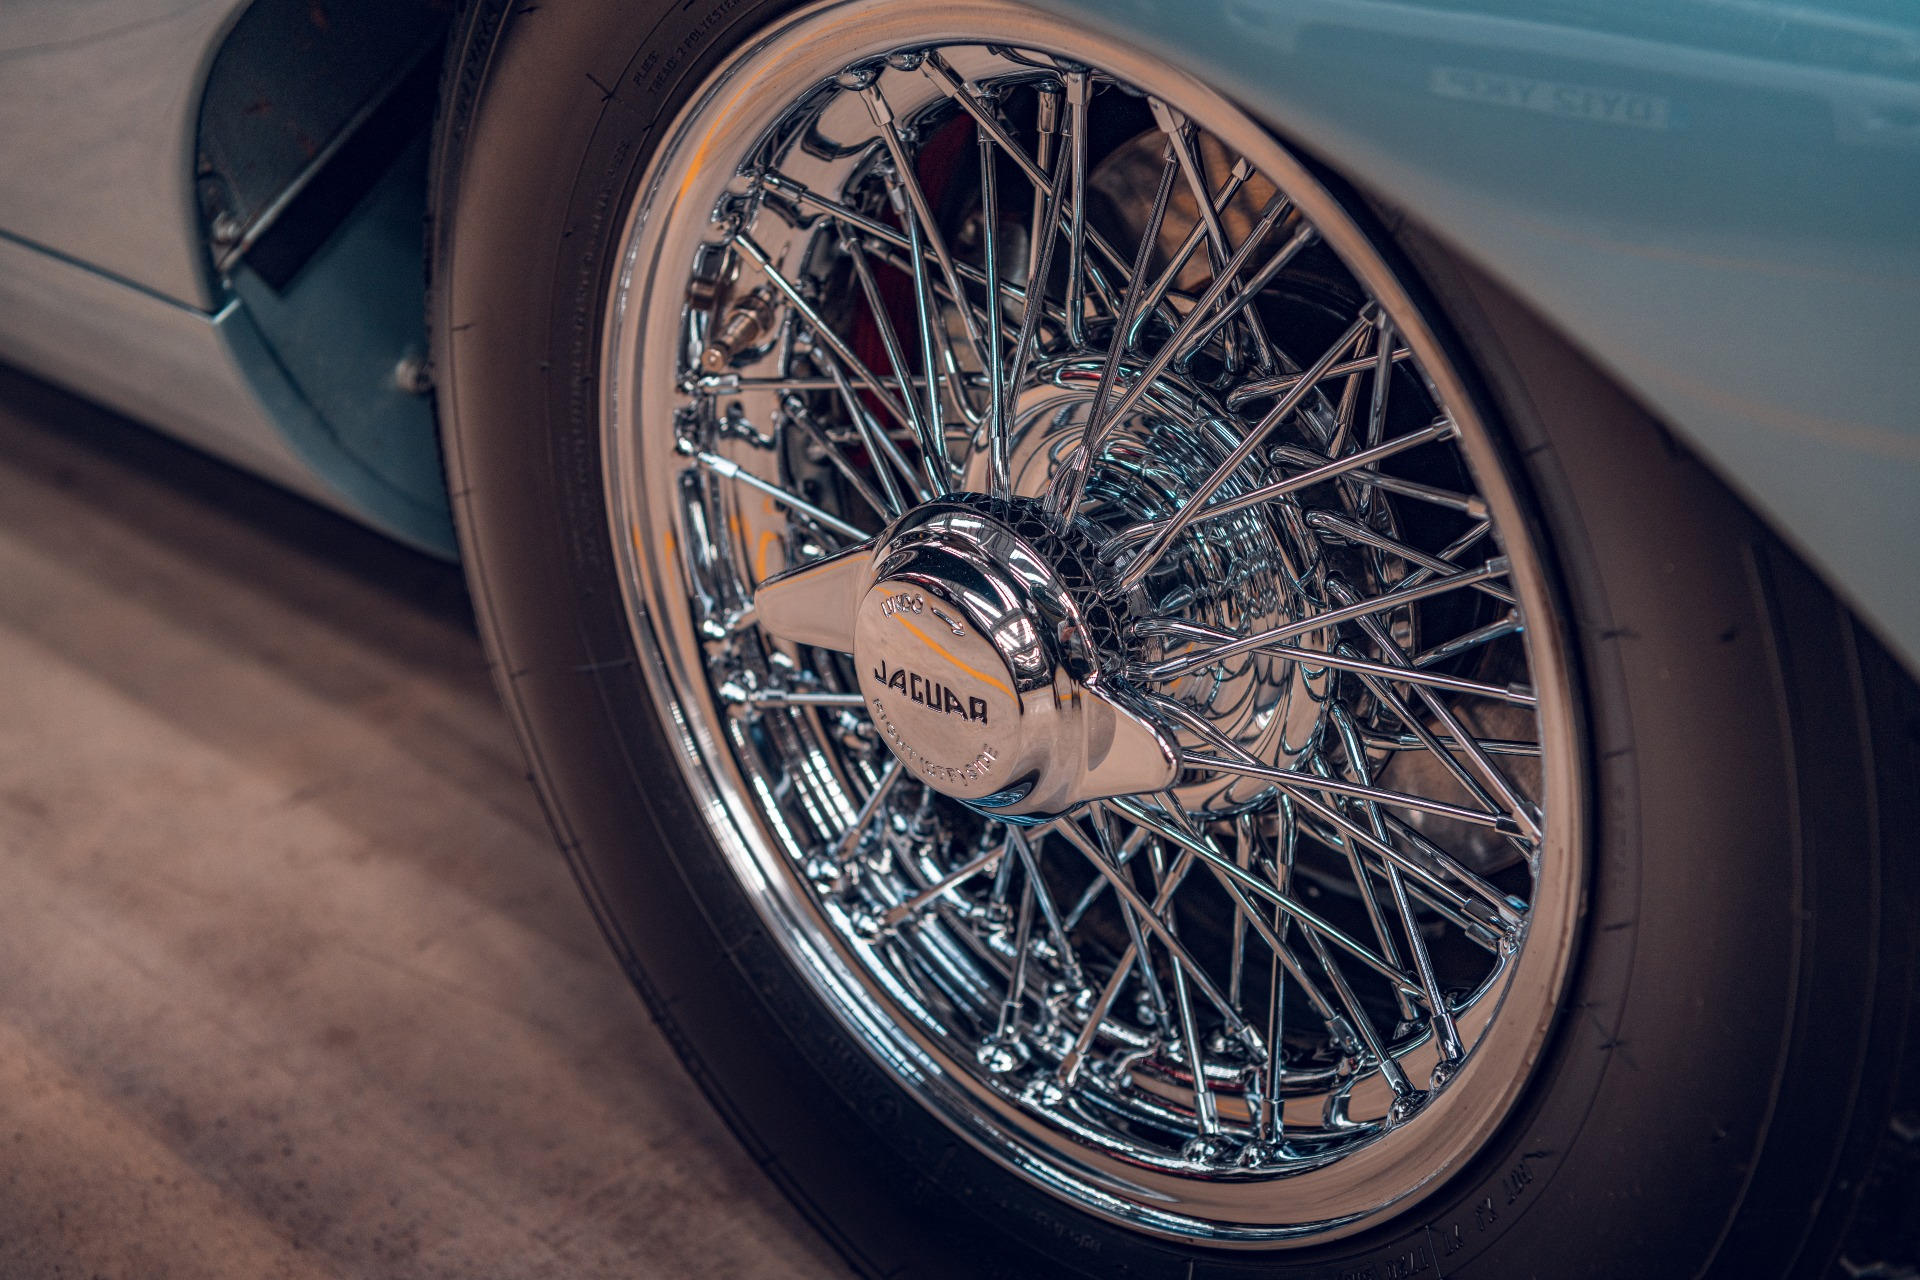 Jaguar E-Type Reborn 1965 Series 1 4.2 wheel detail wire spoke